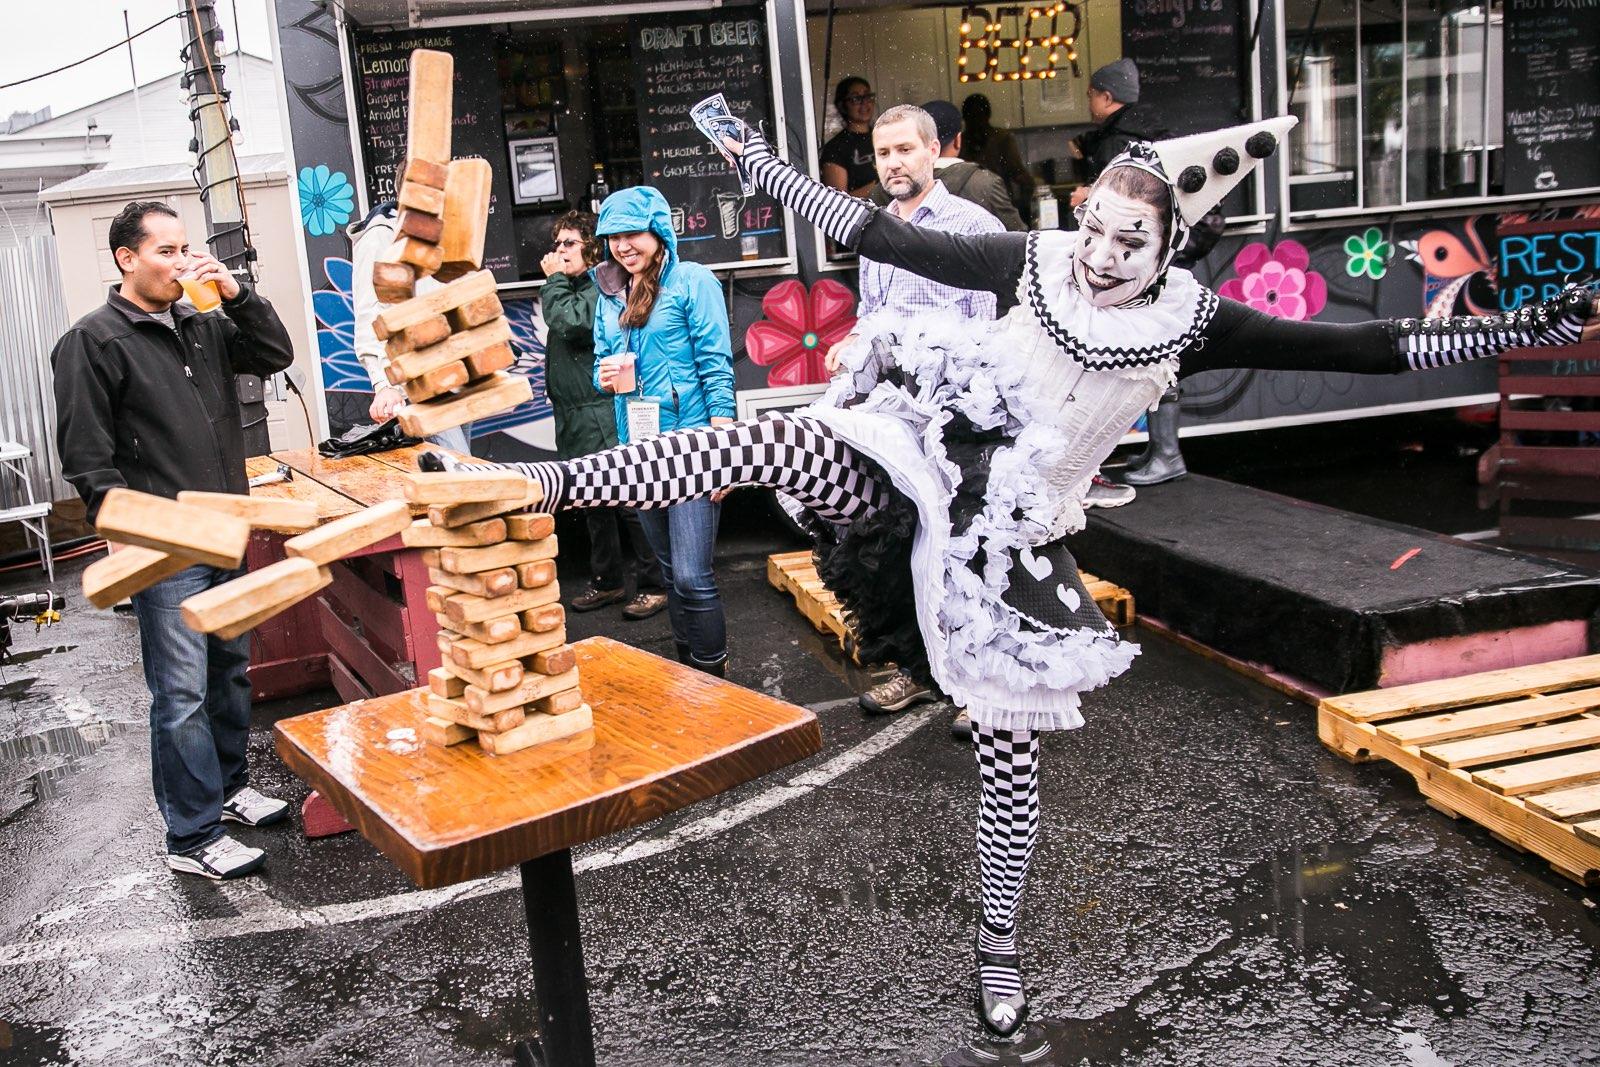 SoMa-StrEat-Food-Park-sf-event Nightlife